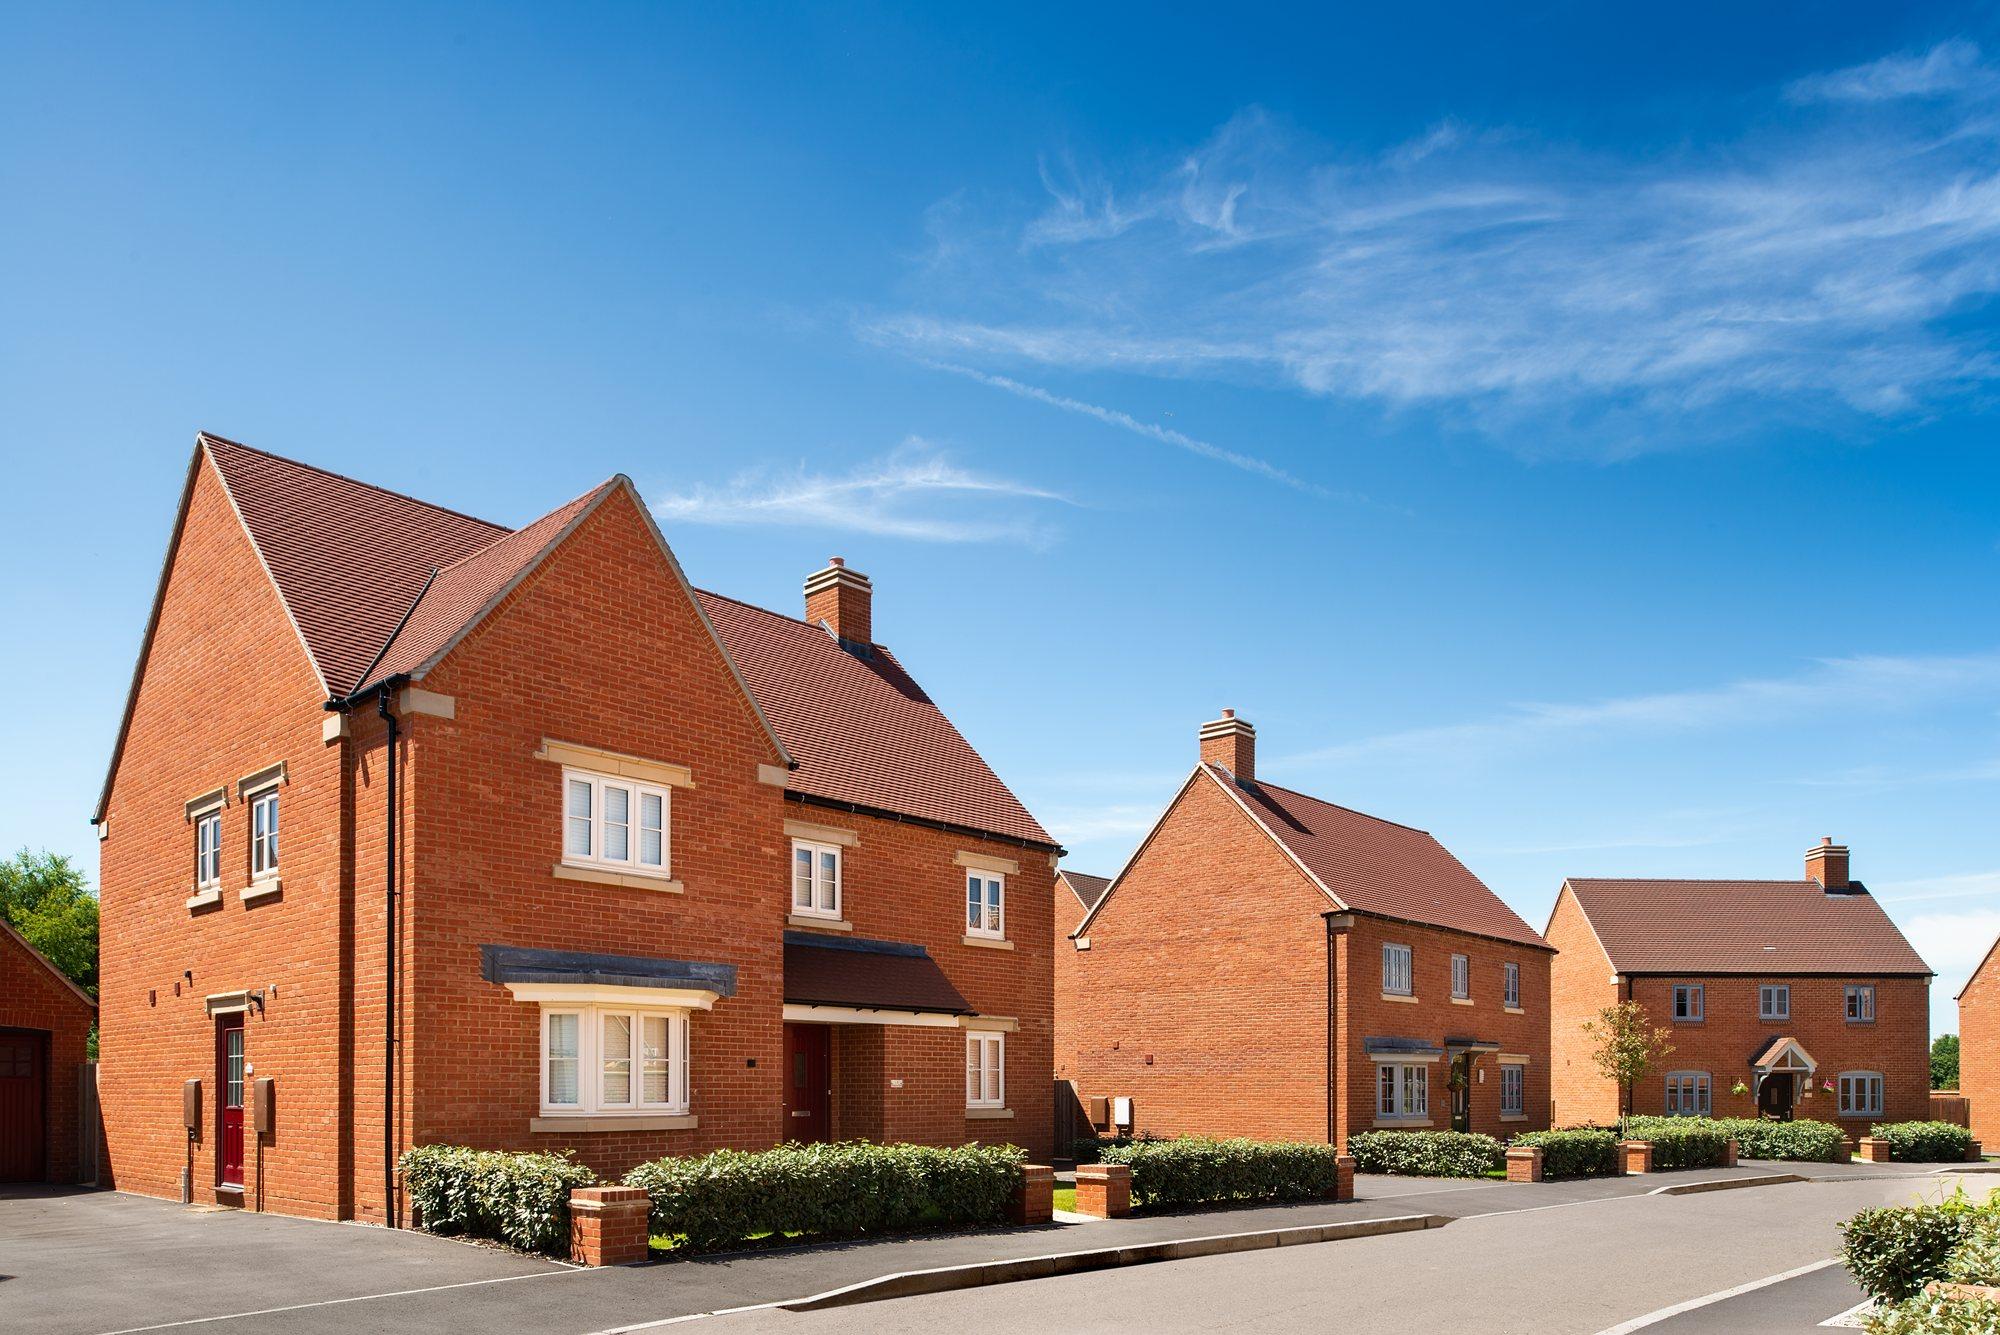 New Build Homes in Brackley